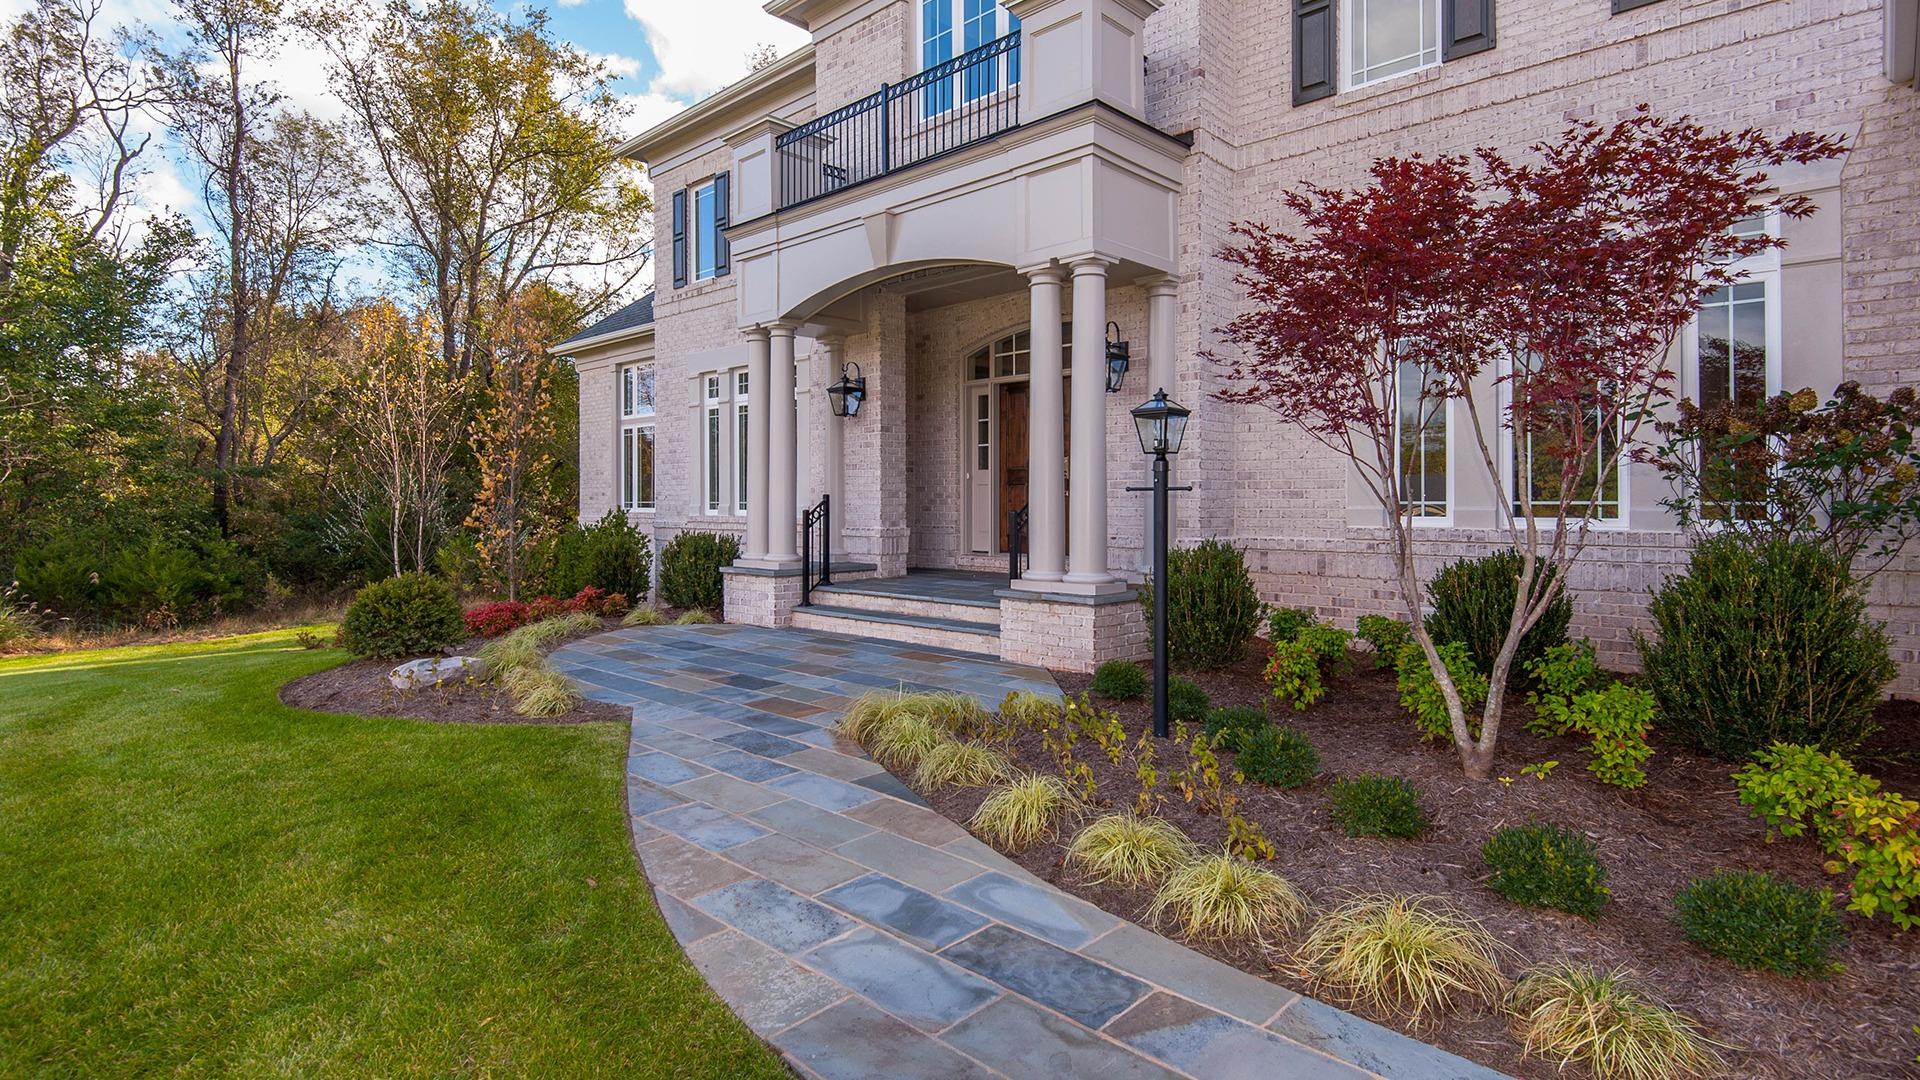 The stone leadwalk to the impressive front doors.